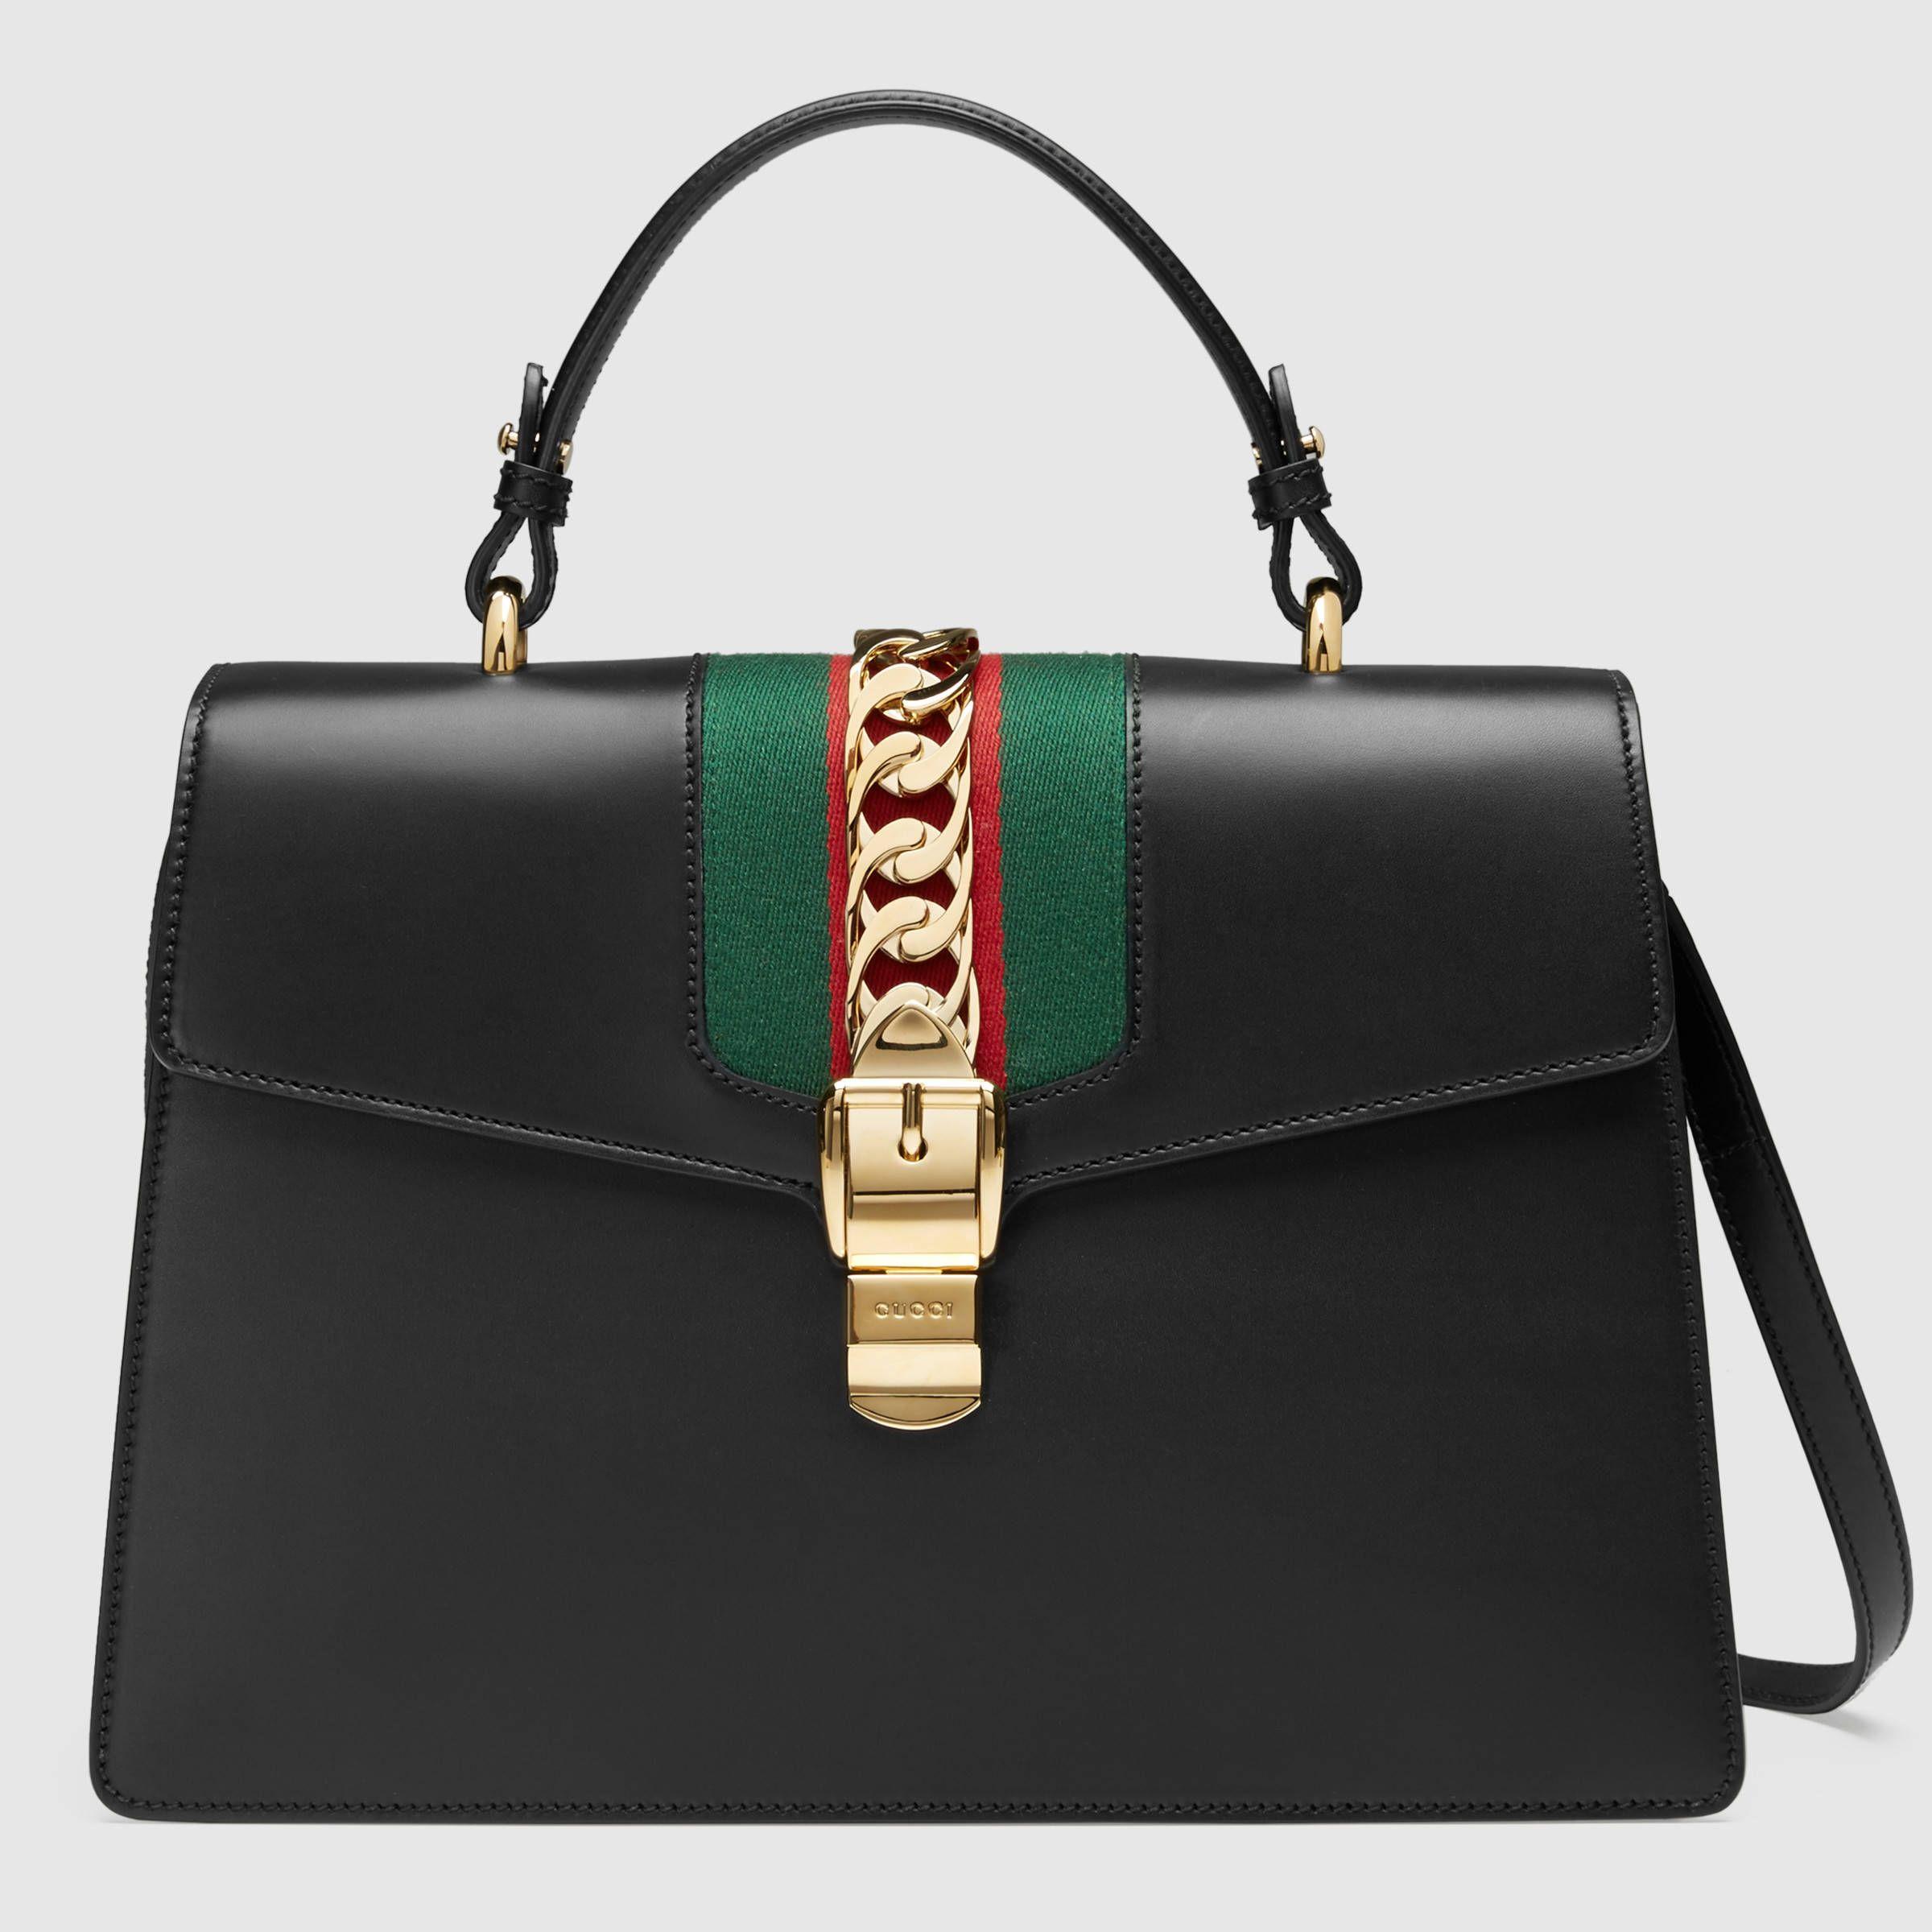 Gucci Donna - Borsa a mano Sylvie in pelle - 431665CVL1G1060 fcda2ae78059